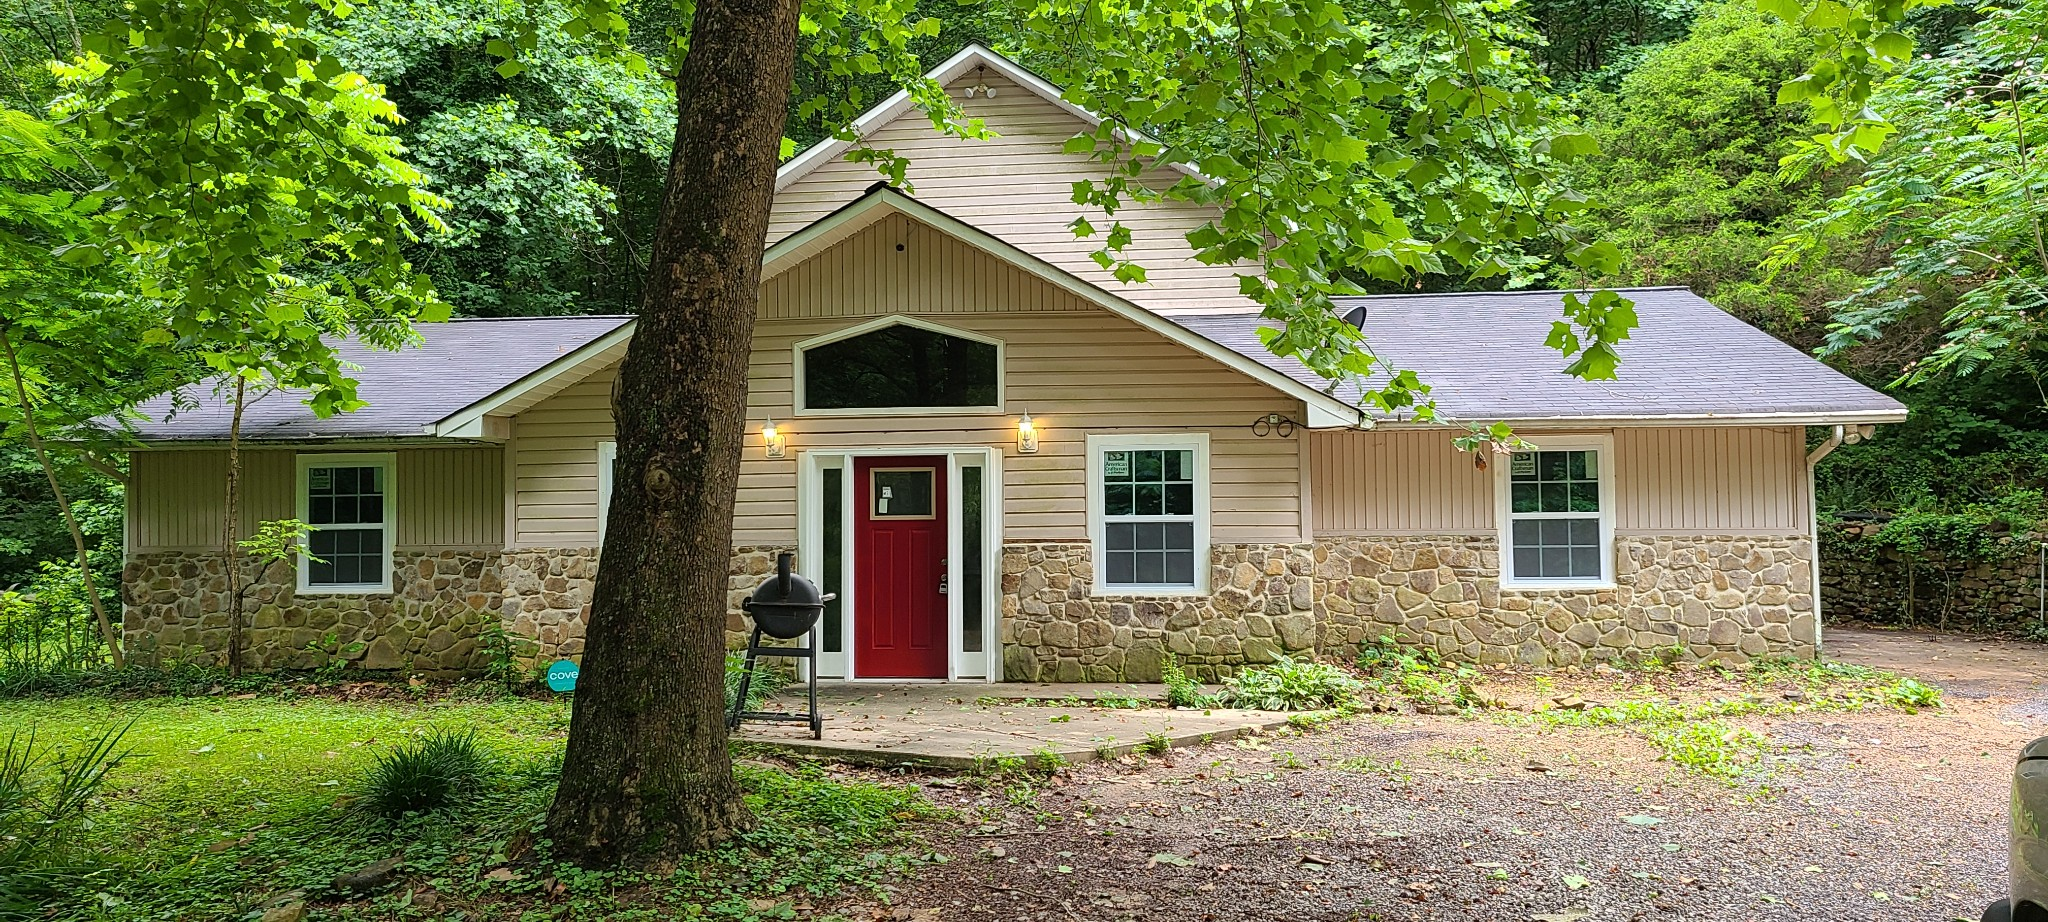 341 Elm St Property Photo - Dunlap, TN real estate listing